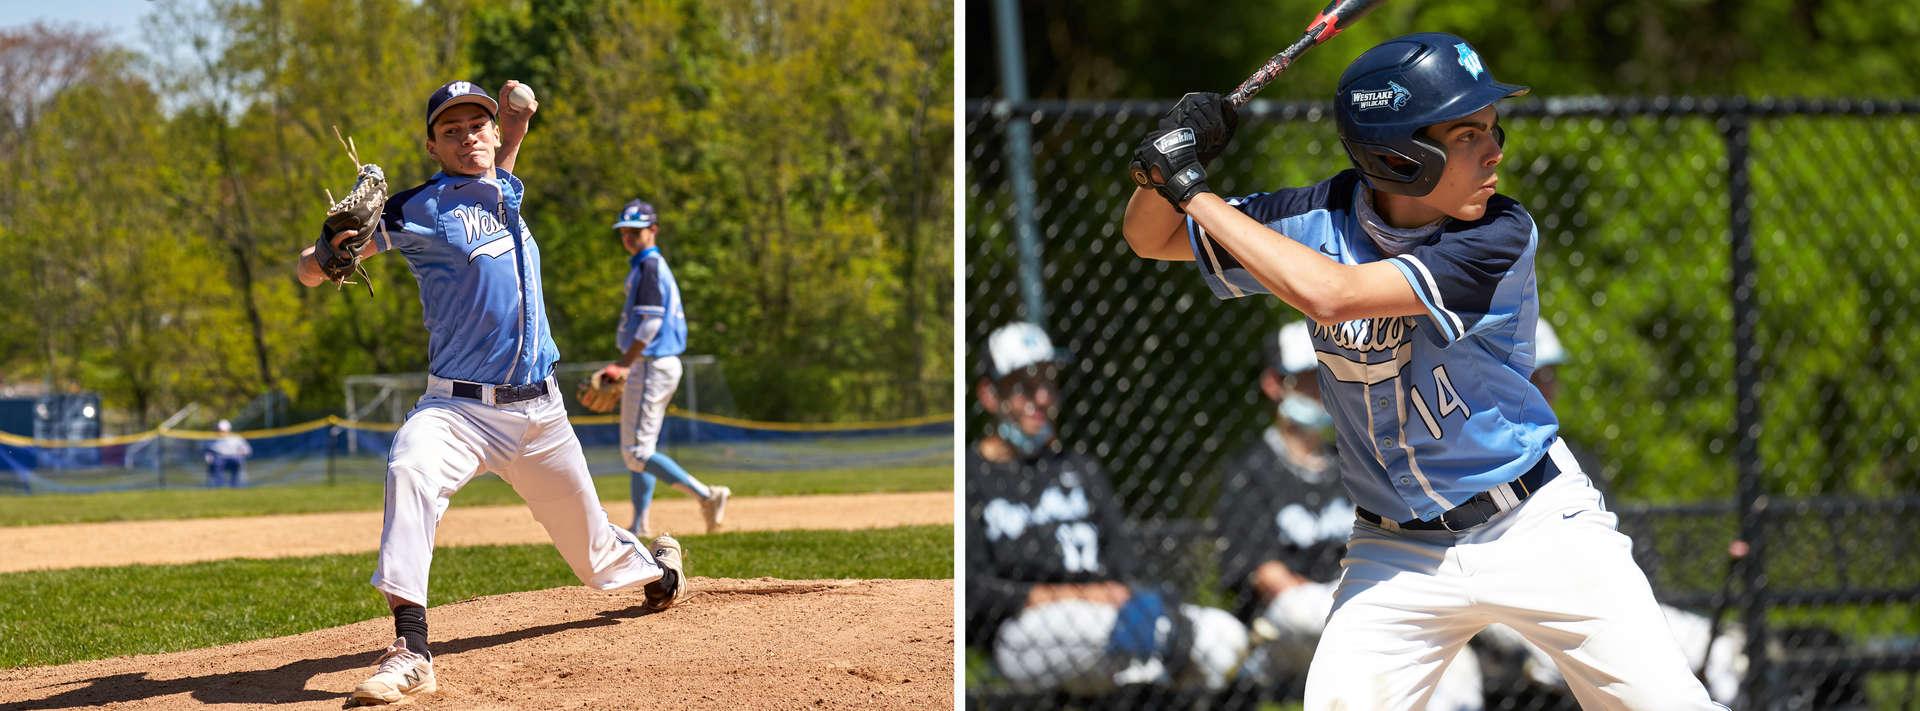 Baseball players batting and pitching